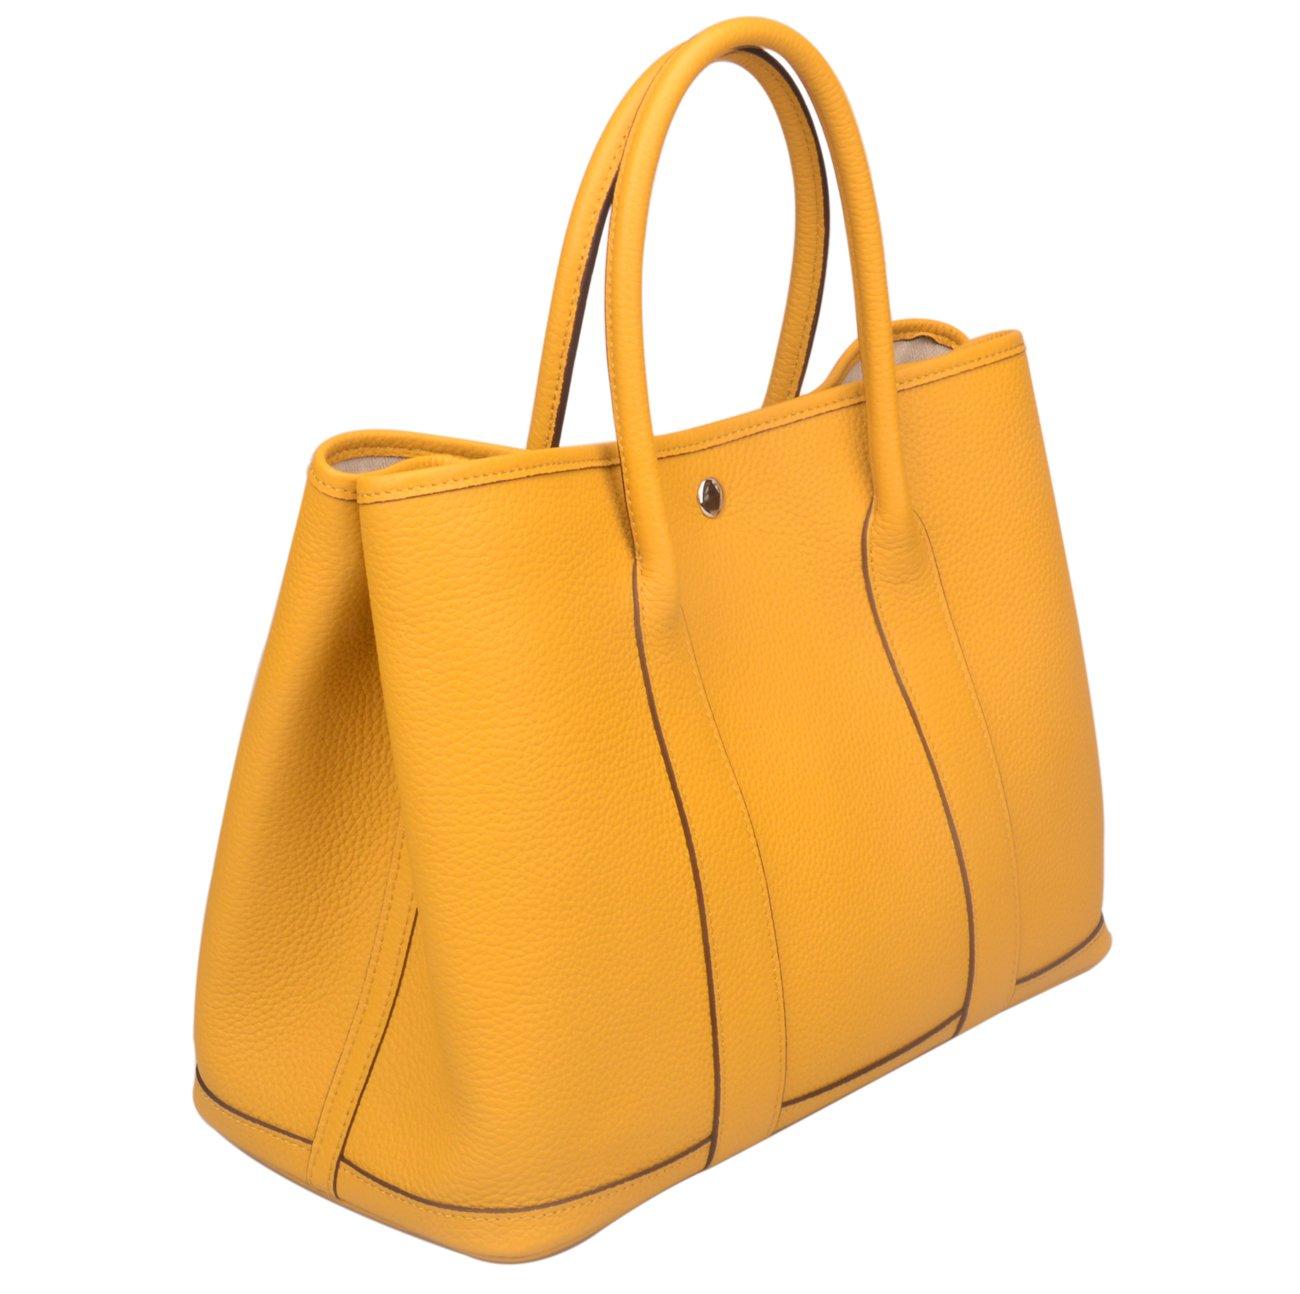 Ainifeel Women's Genuine Leather Tote Bag Top Handle Handbags (Dark Yellow)